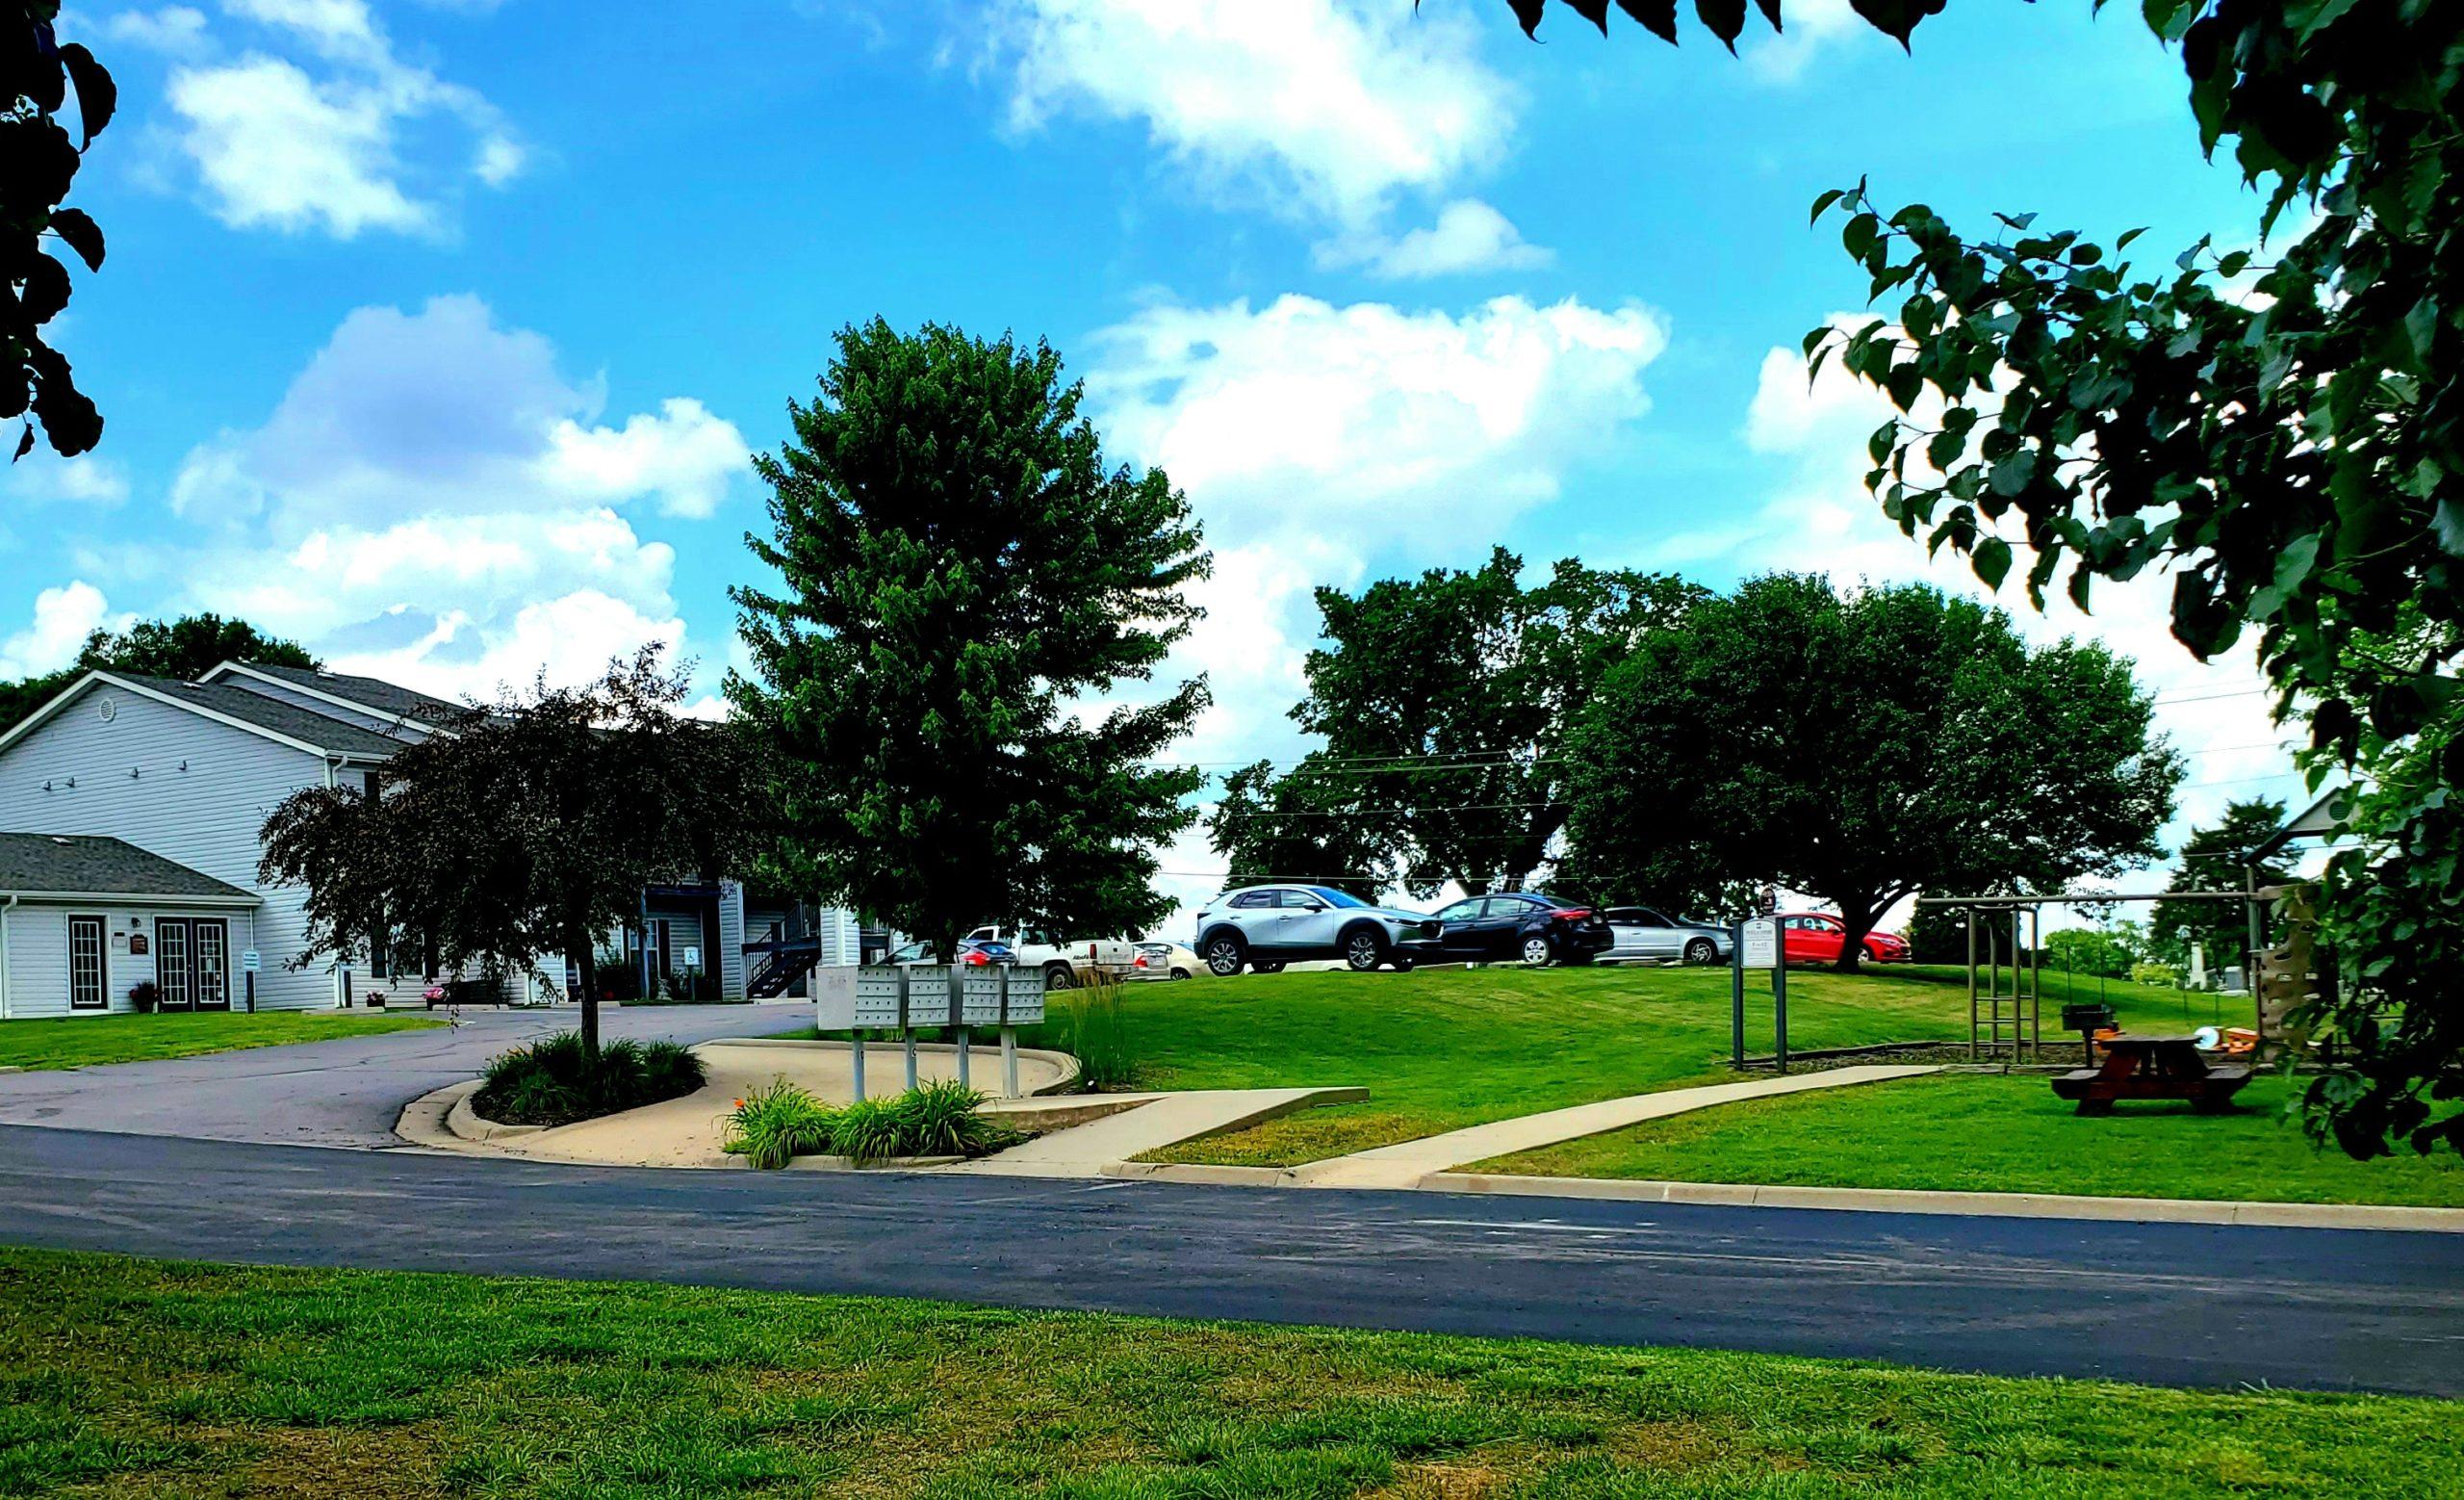 Parkford Apts Iola KS exterior picnic area